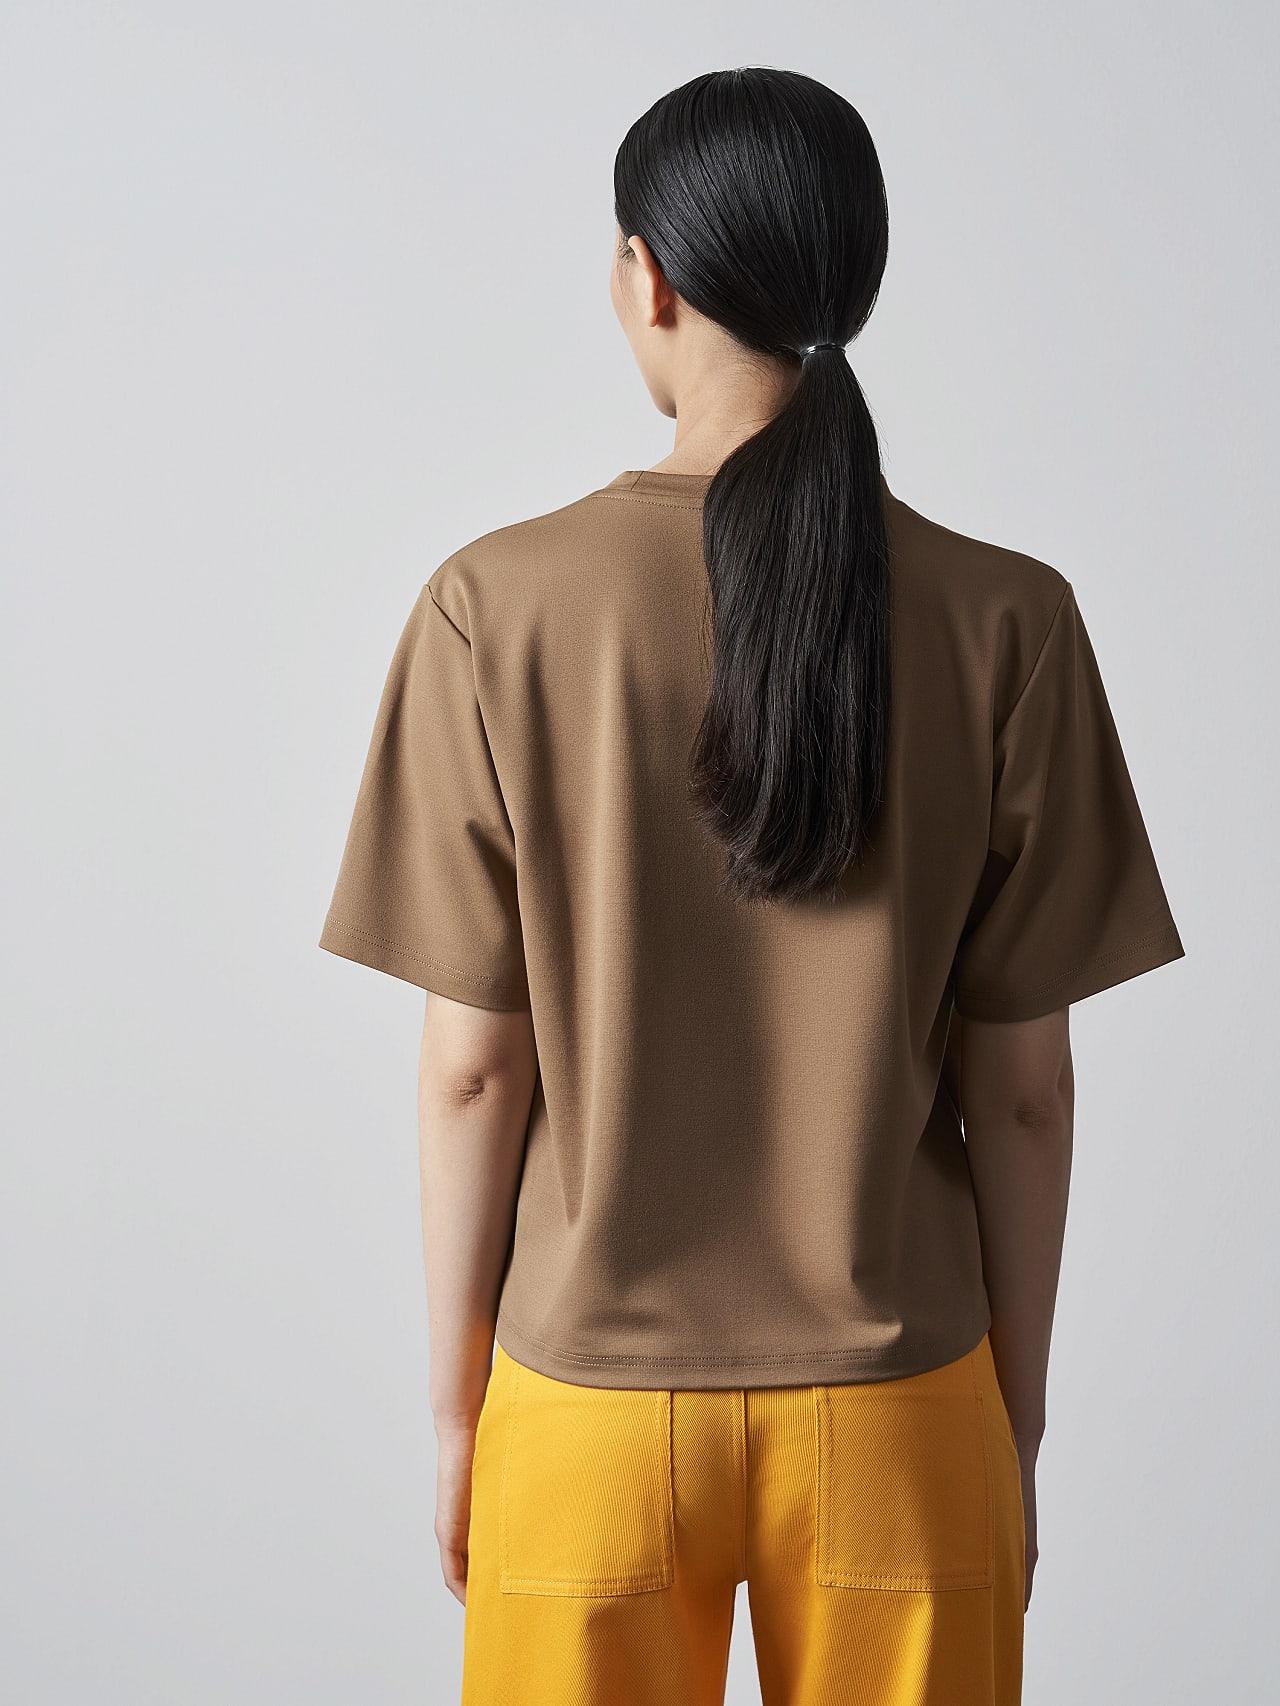 JASHU V1.Y5.02 Heavy-Weight Logo T-Shirt gold Front Main Alpha Tauri